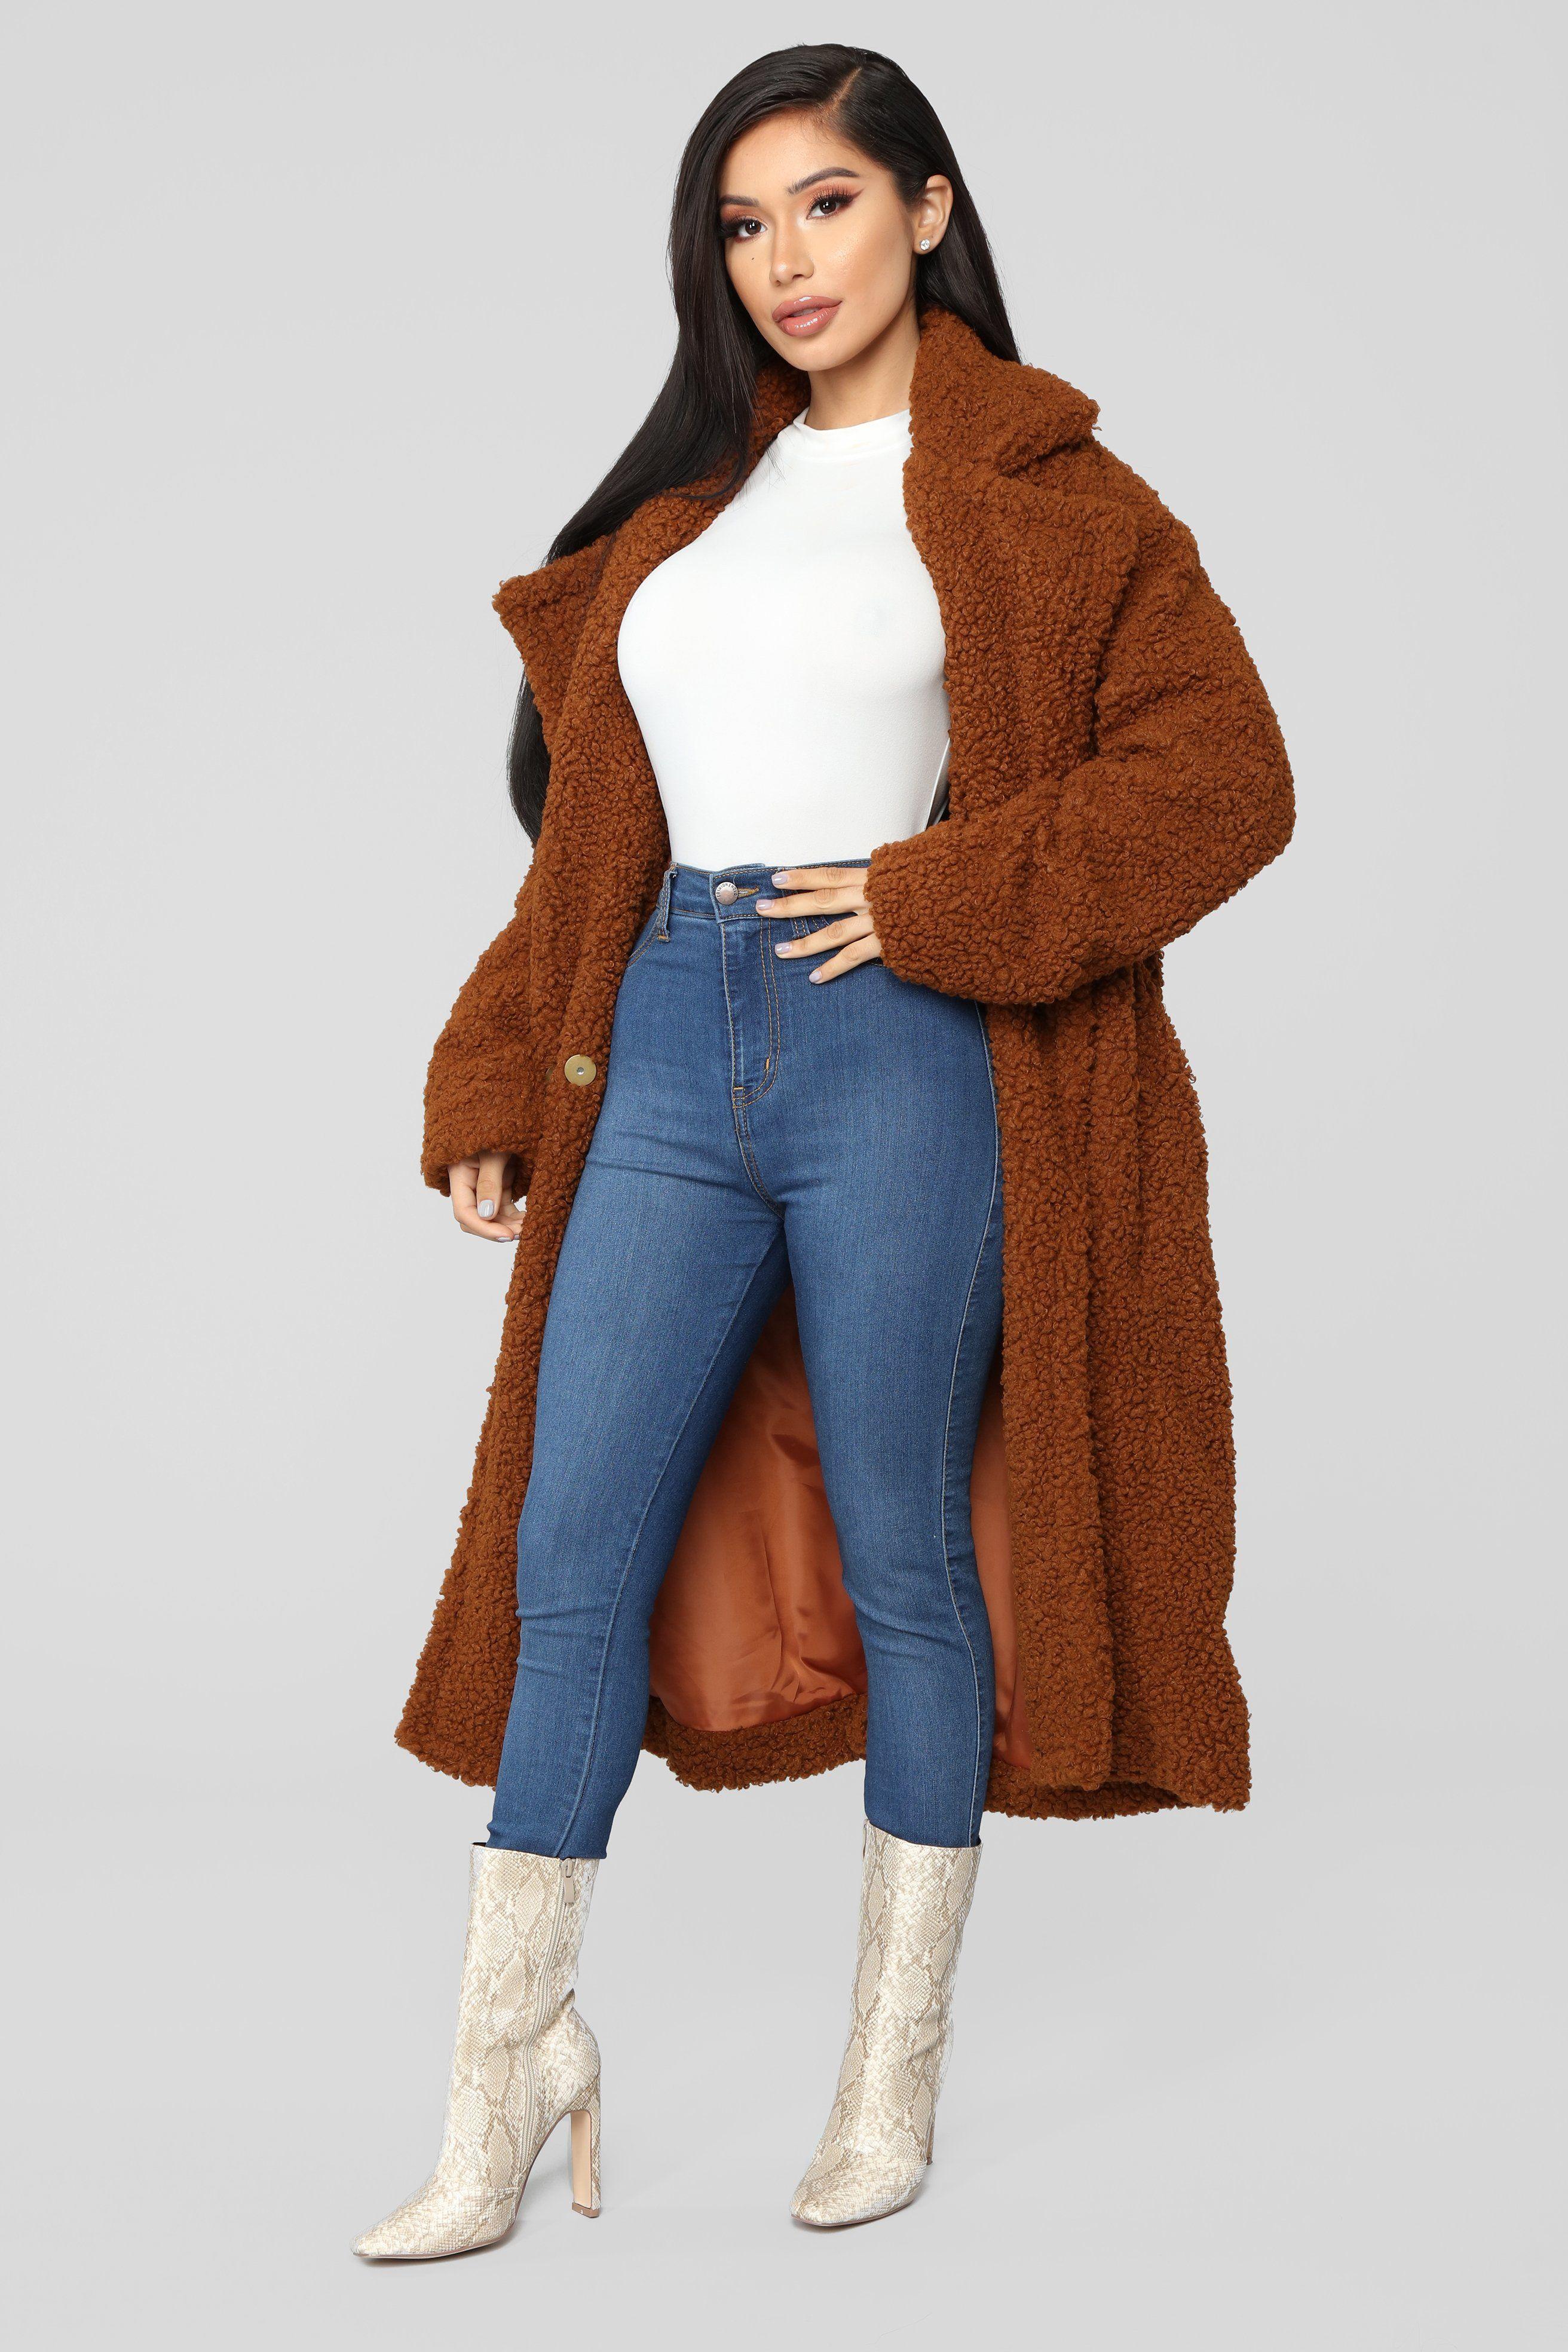 Classic High Waist Skinny Jeans Medium Blue Wash In 2020 Fashion Nova Outfits Winter Fashion Outfits High Waisted Skinny Jeans